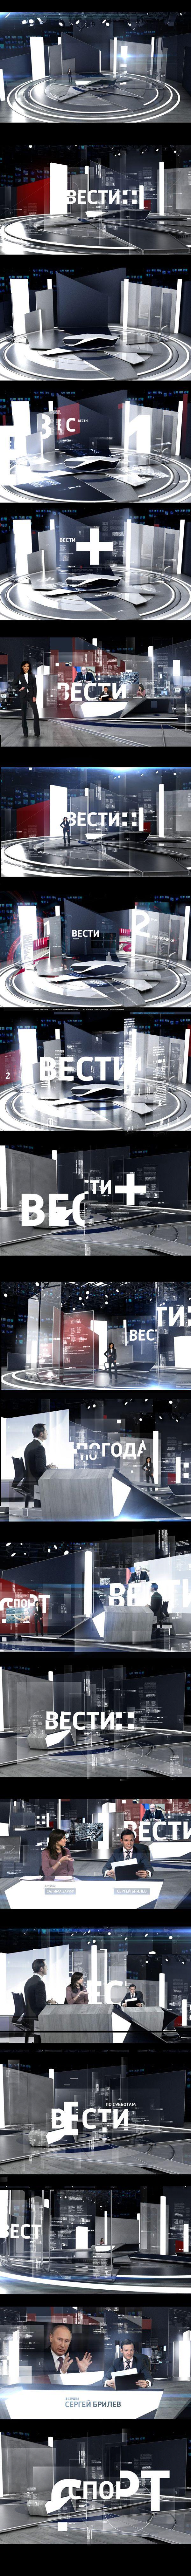 RUSSIA_1 channel NEWS STUDIO by egor antonov, via Behance.  Styleframes for broadcast design. Motion graphics